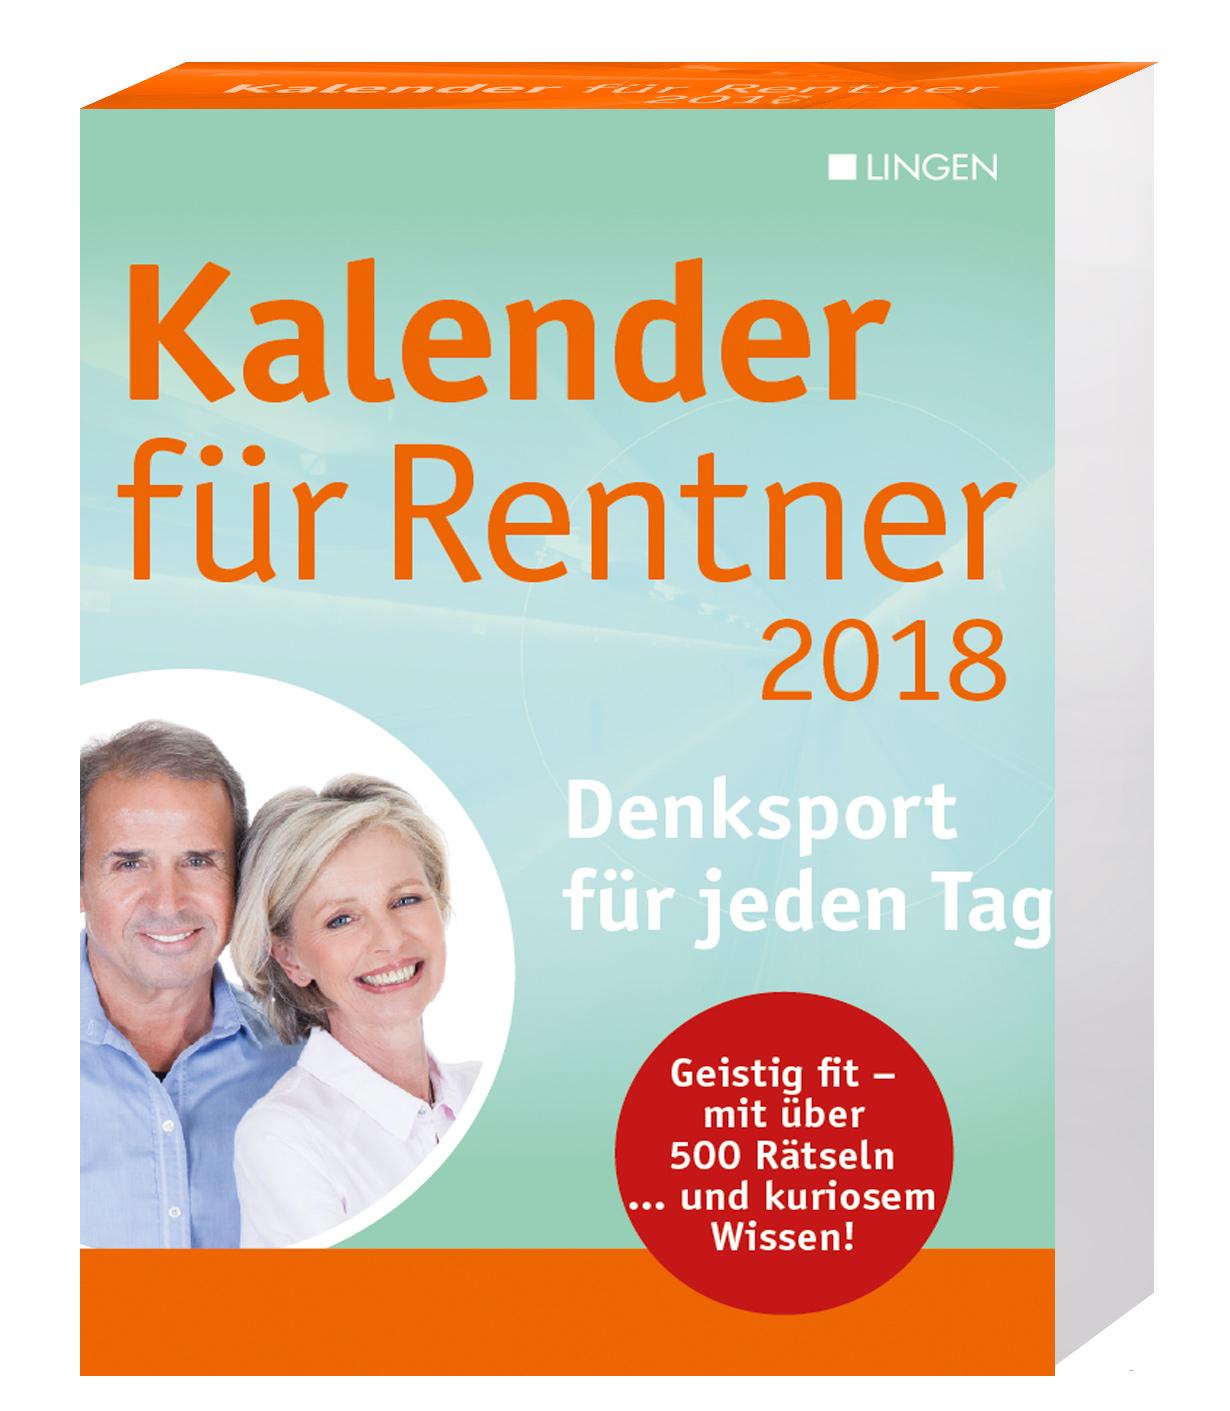 kalender f r rentner 2018 m rkische onlinezeitung shop. Black Bedroom Furniture Sets. Home Design Ideas